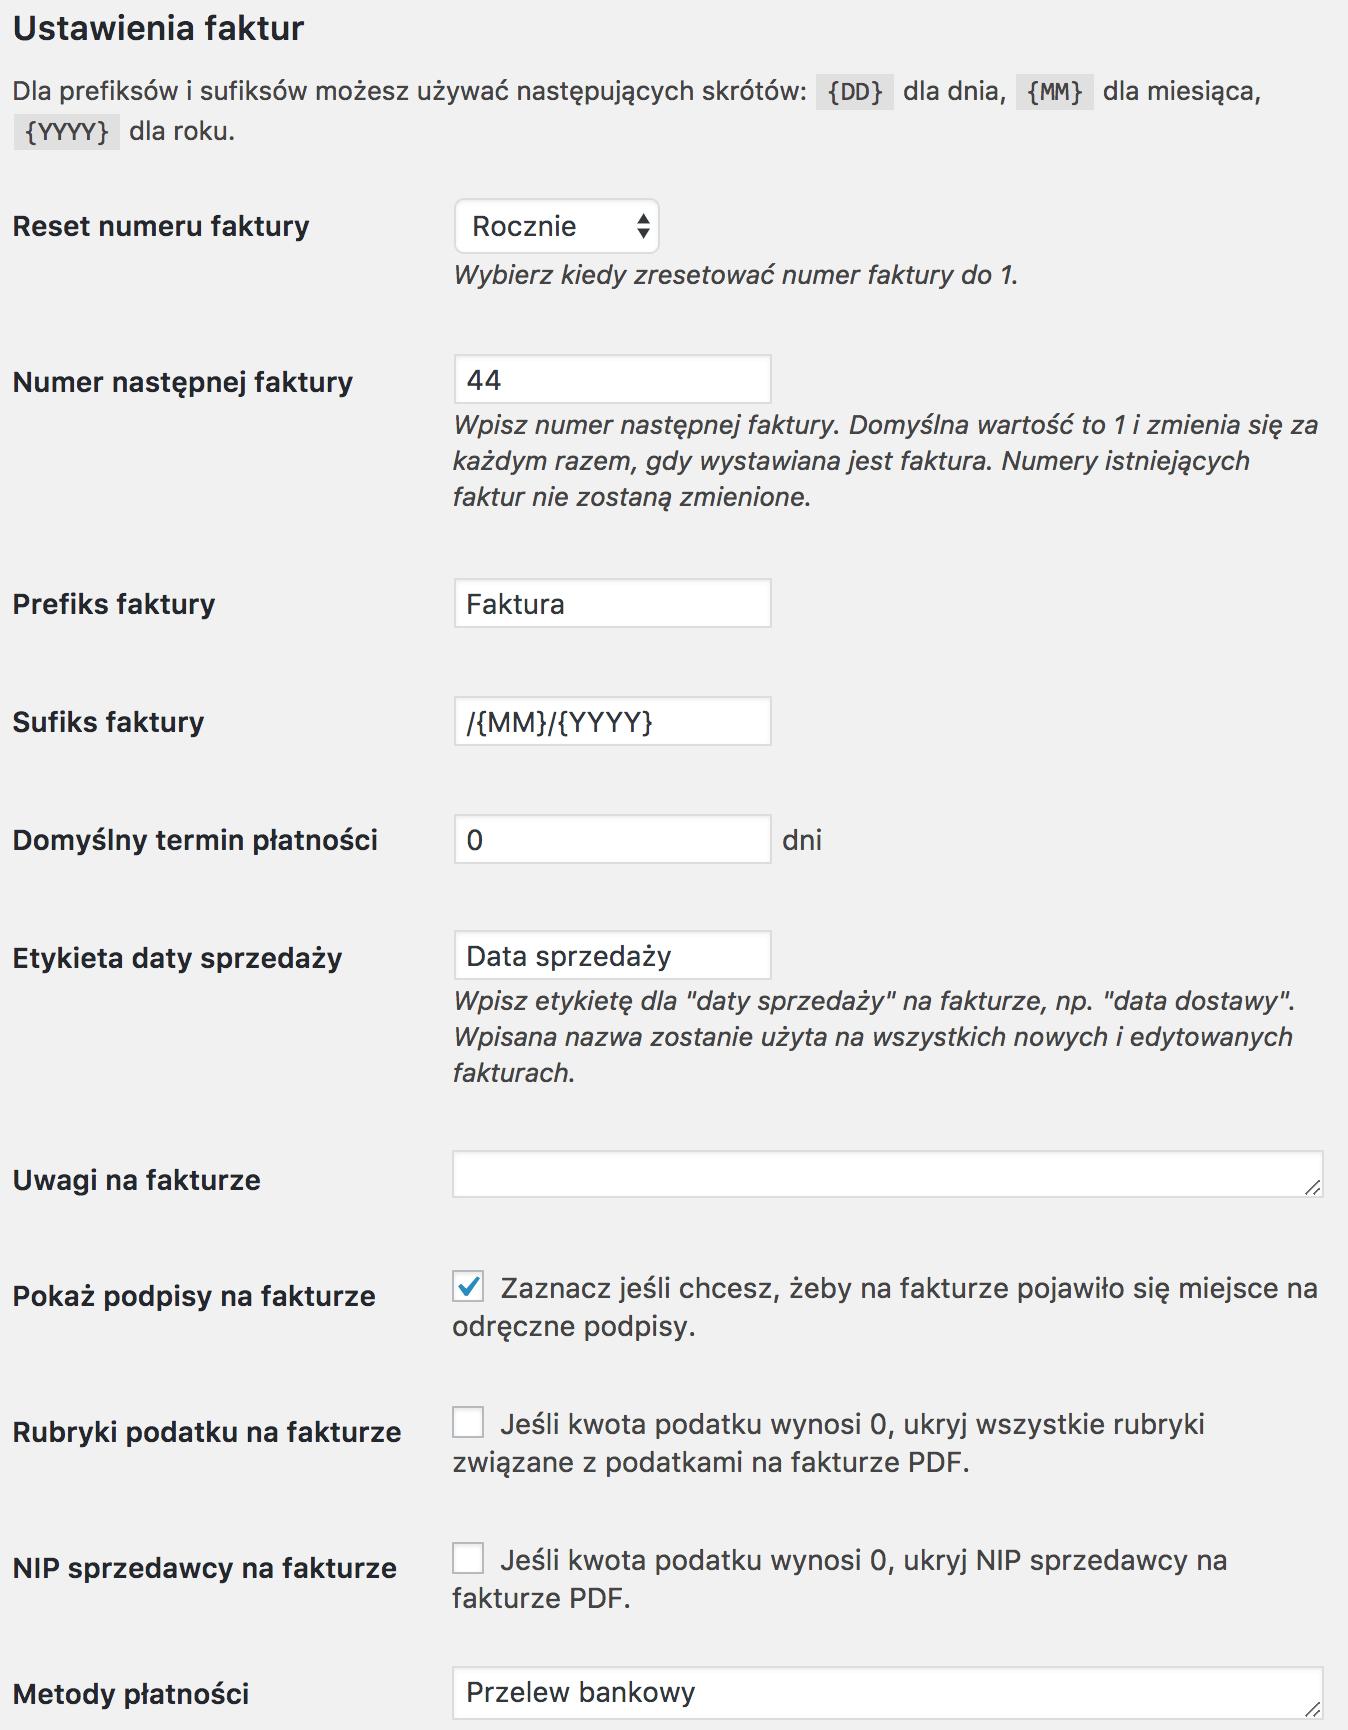 Faktury WordPress - Ustawienia faktur